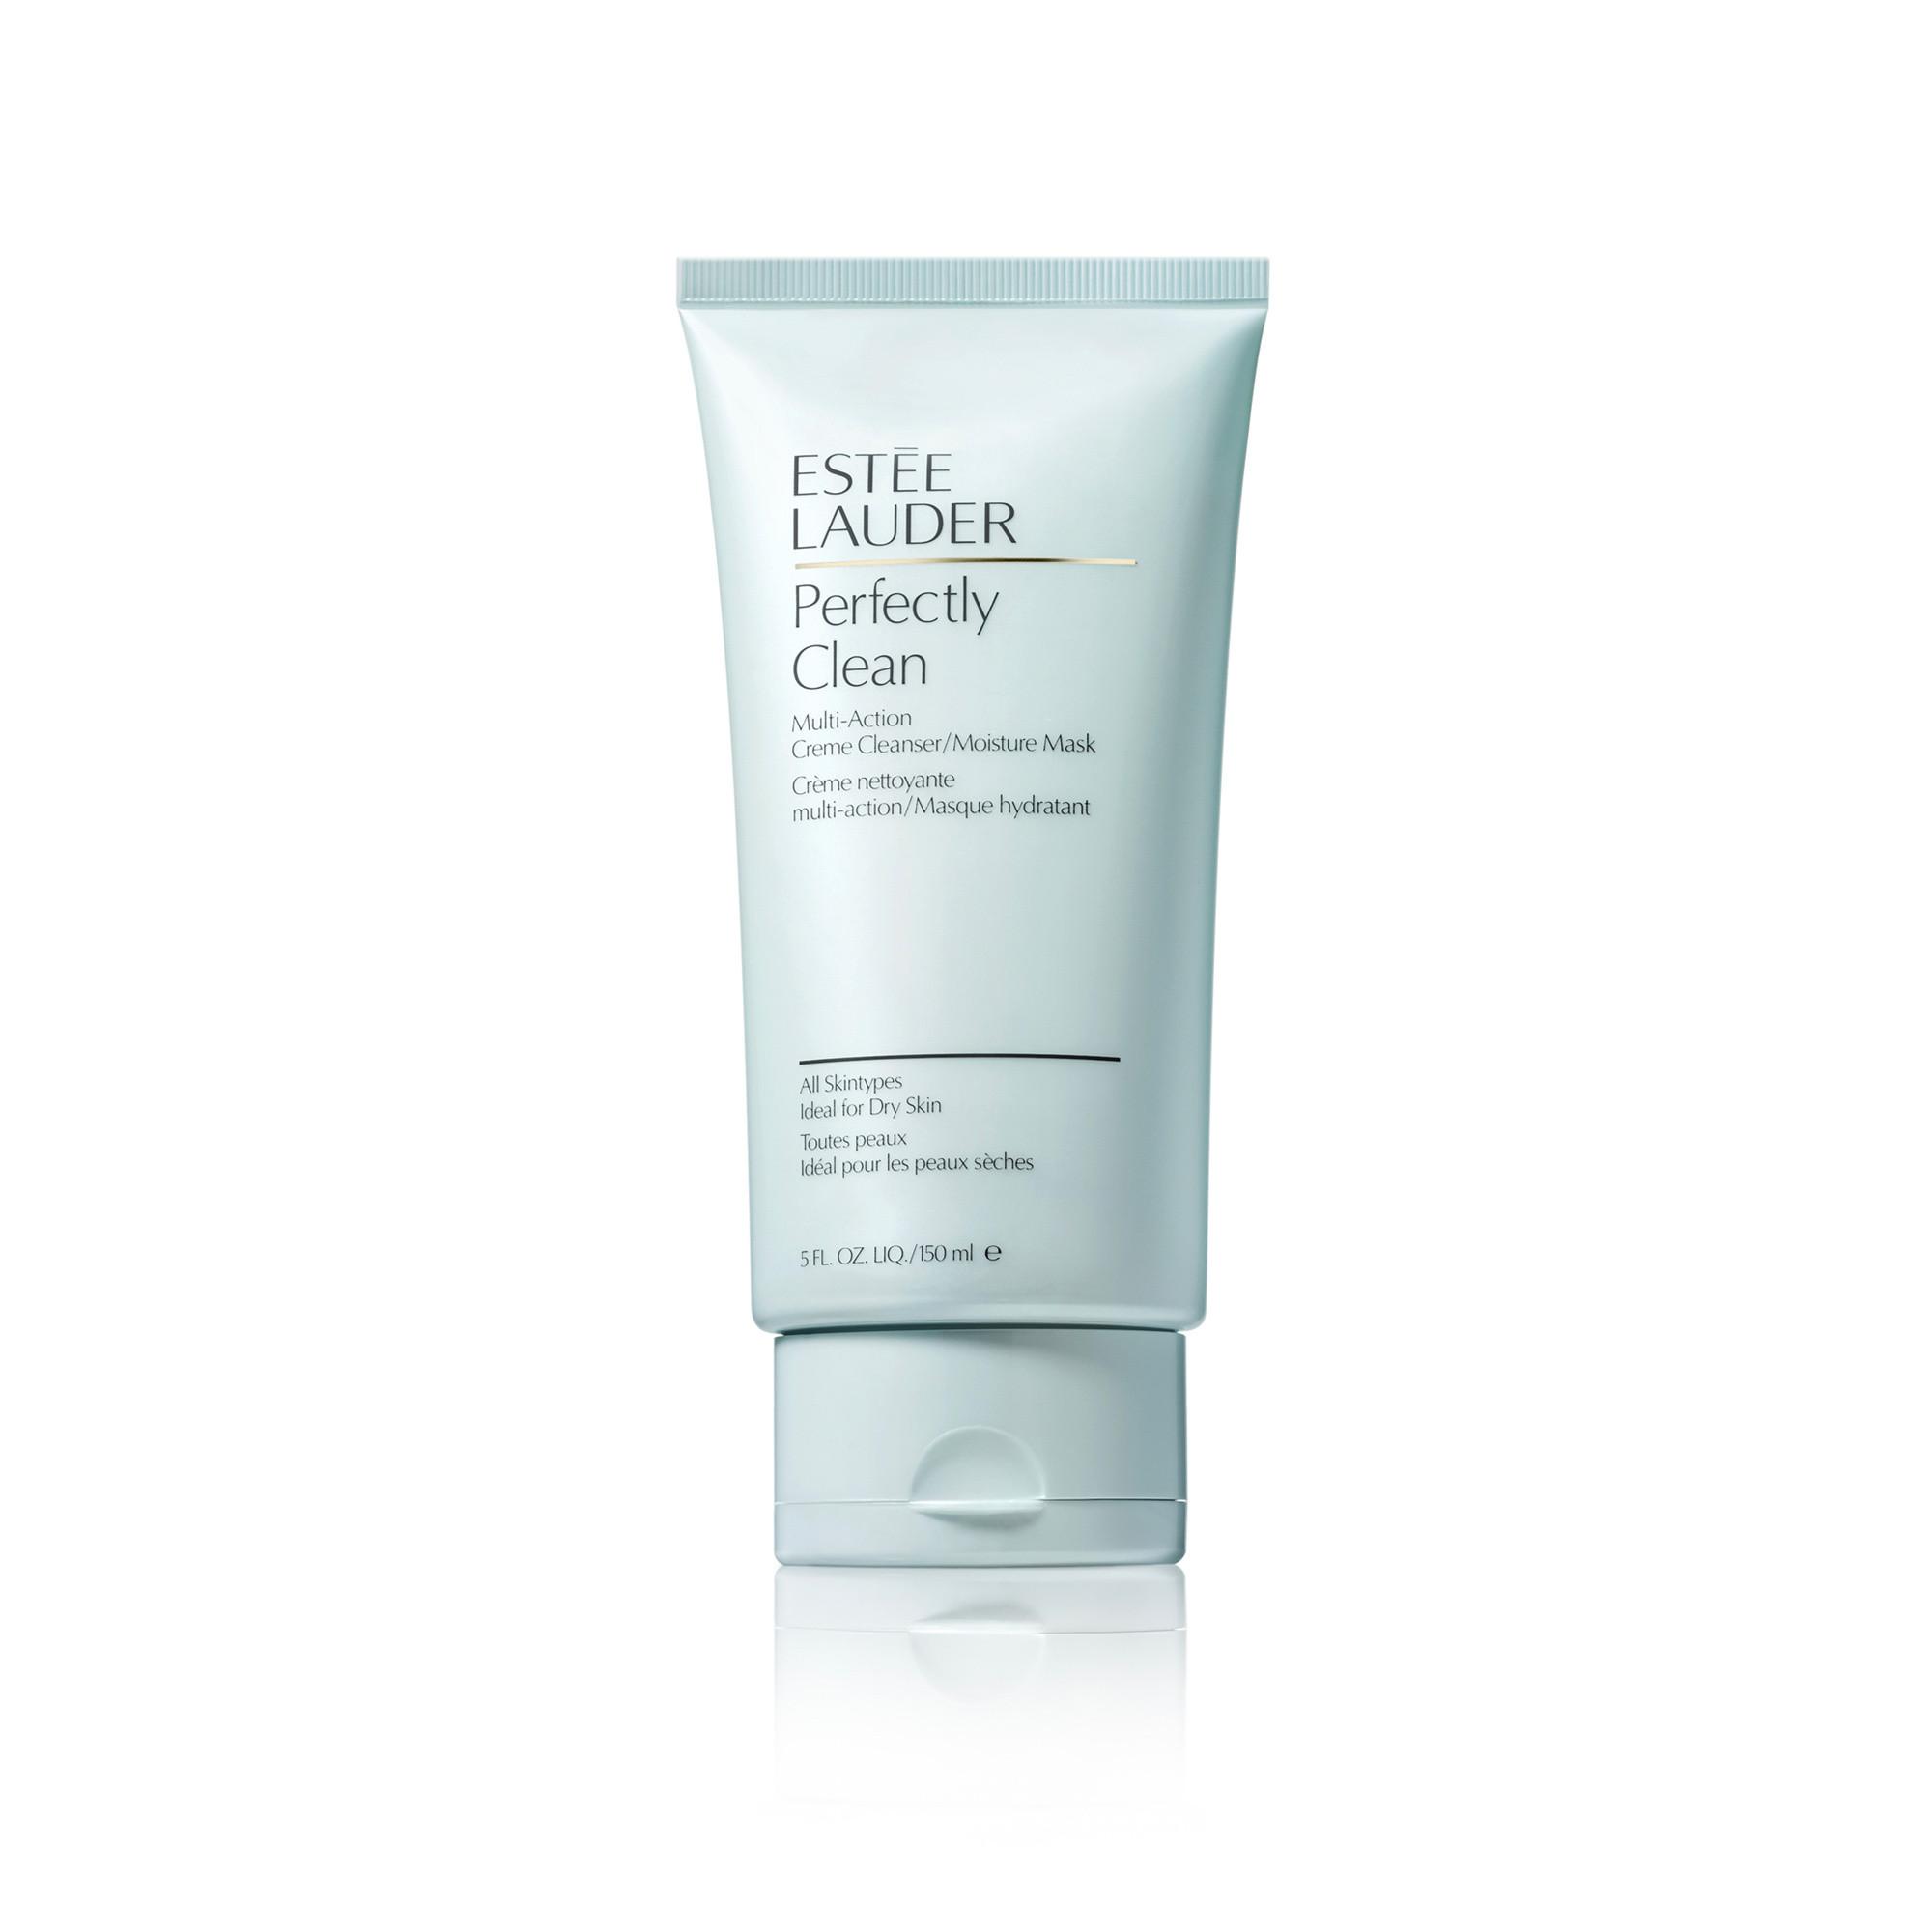 Estée Lauder perfectly clean multi-action creme cleanser/moisture mask 150 ml, Azzurro, large image number 0